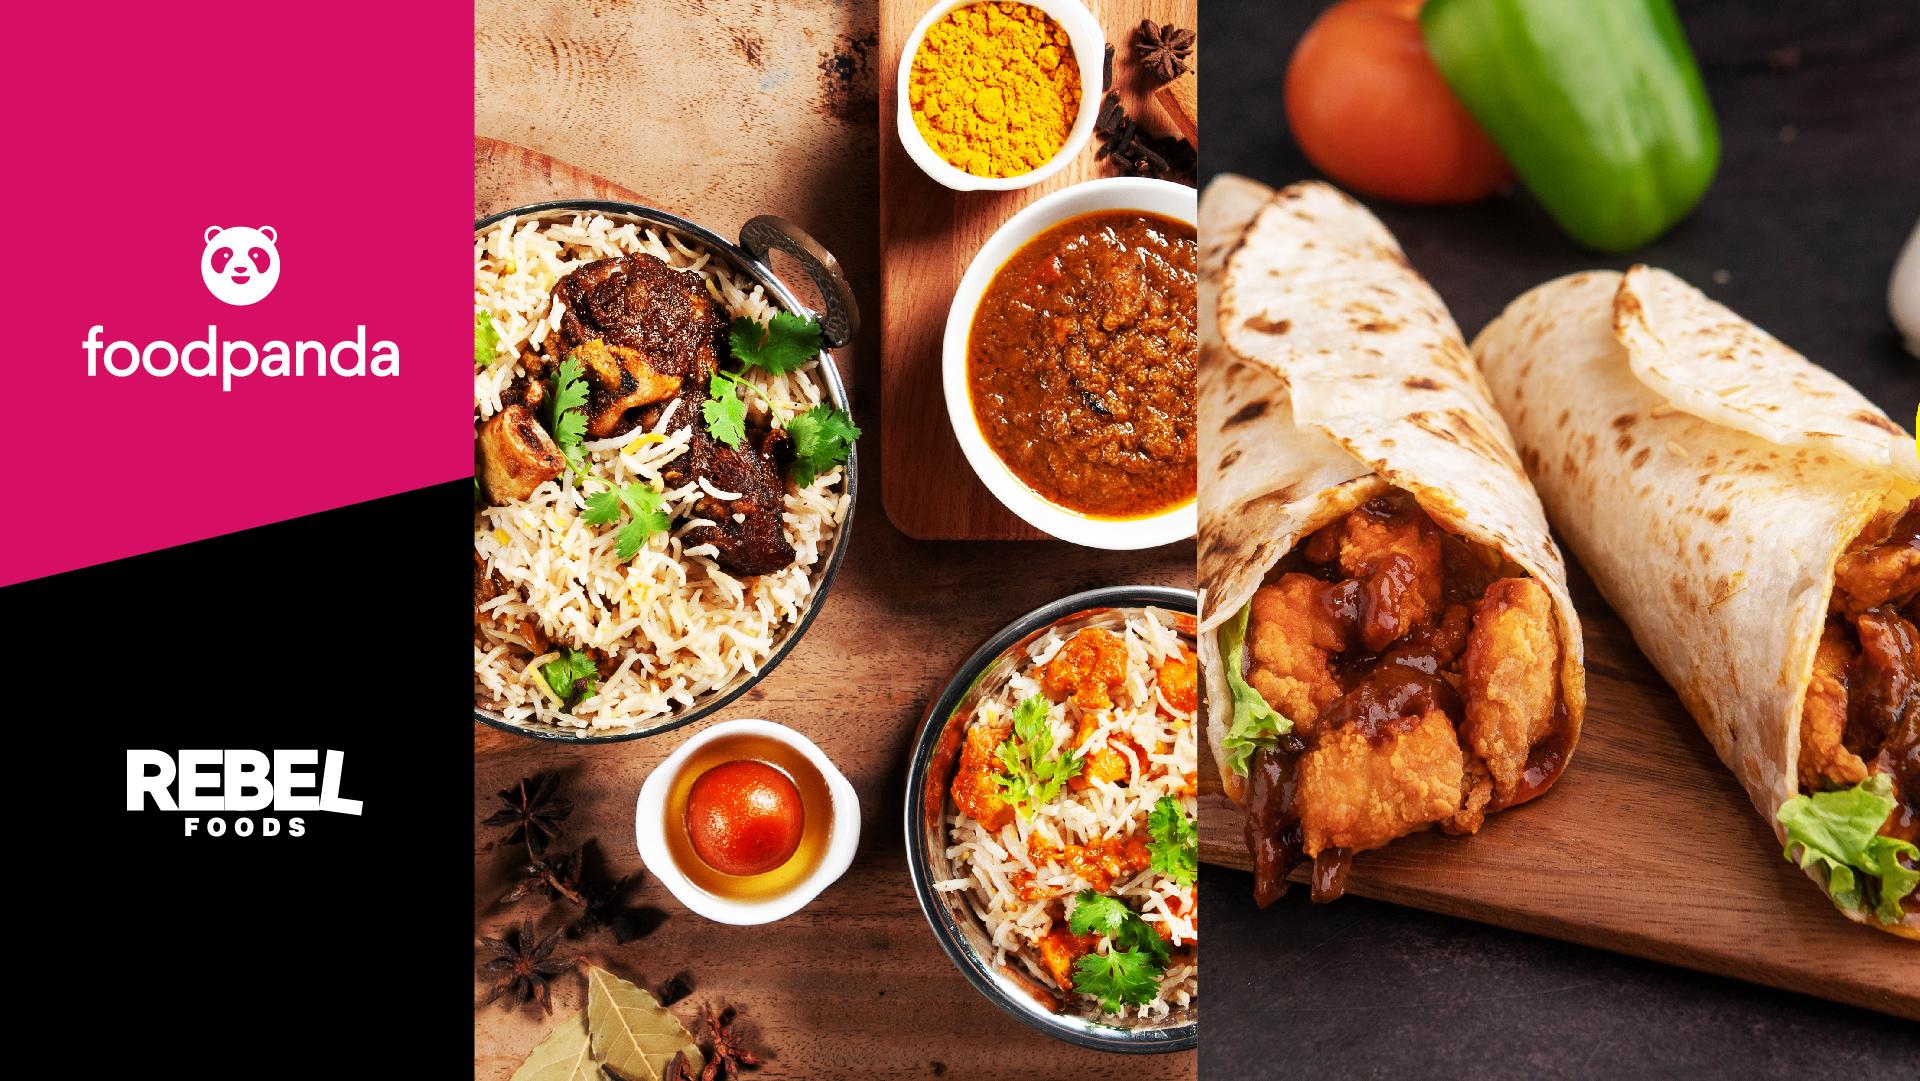 foodpanda and Rebel Foods launch Asias largest virtual brands partnership